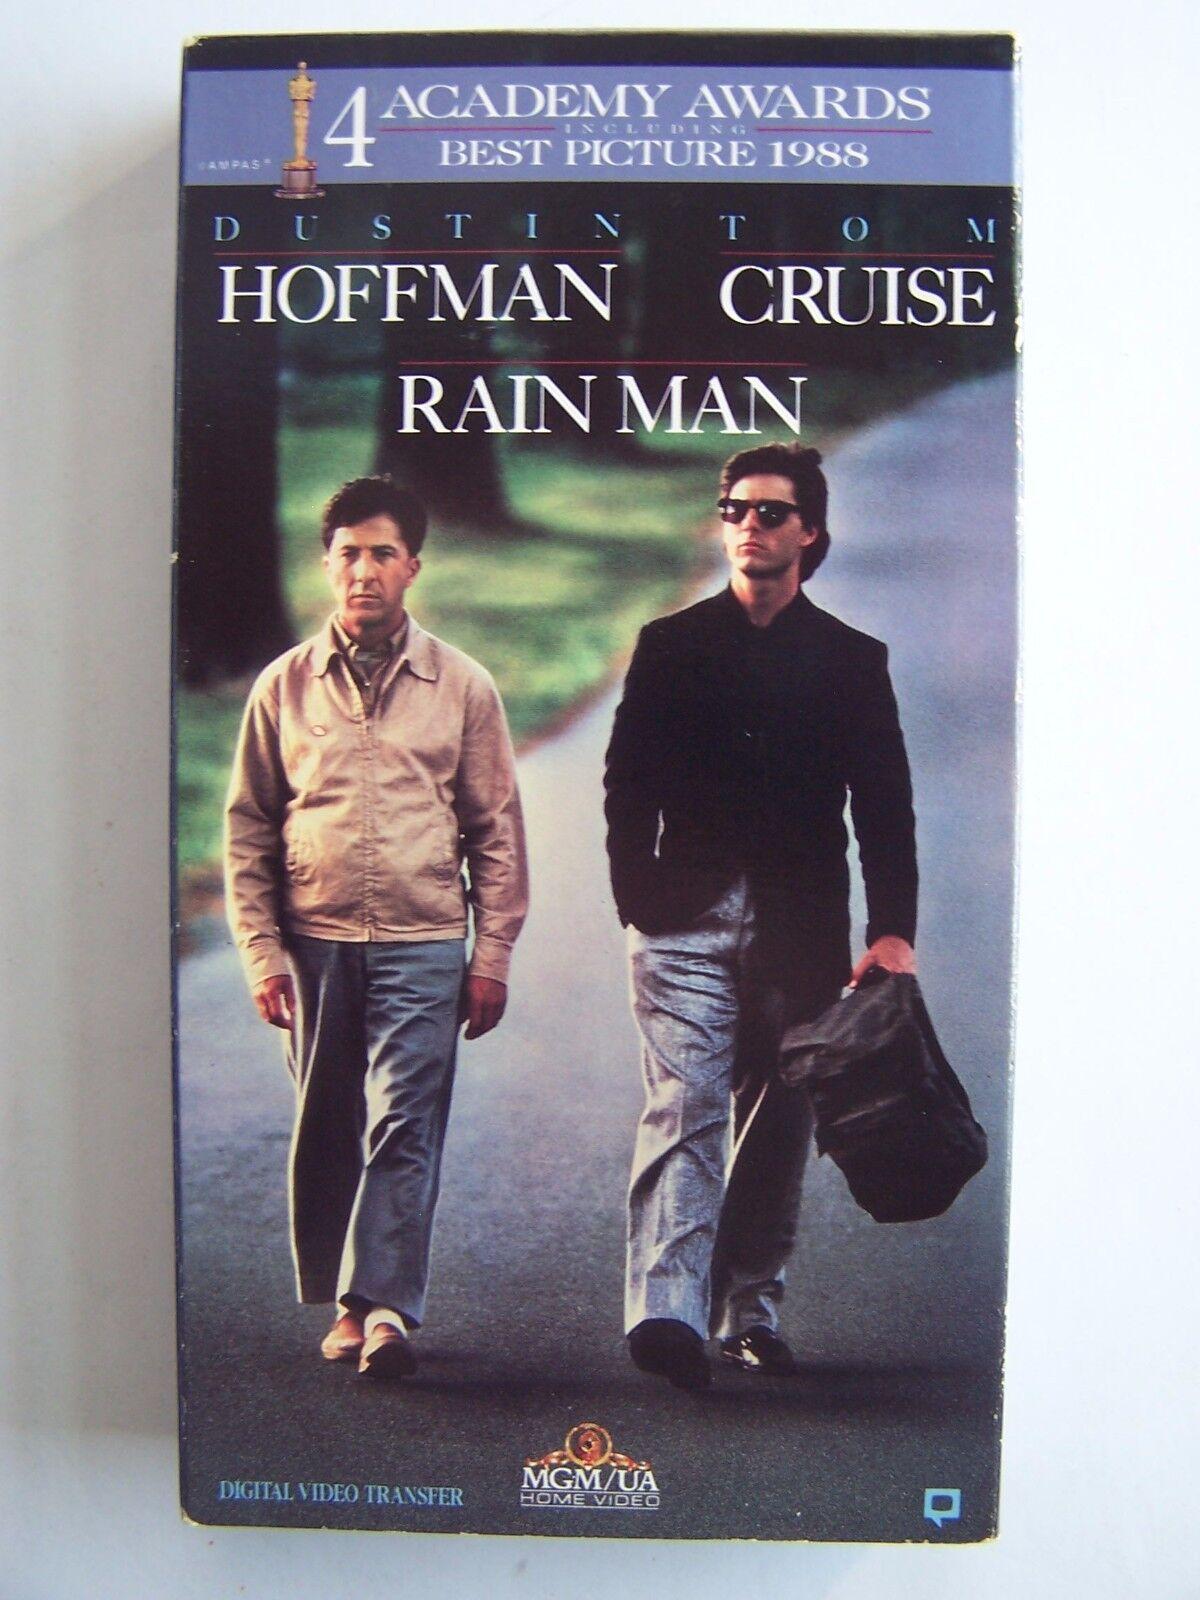 Rain Man VHS Tom Cruise Dustin Hoffman Academy Award Wi